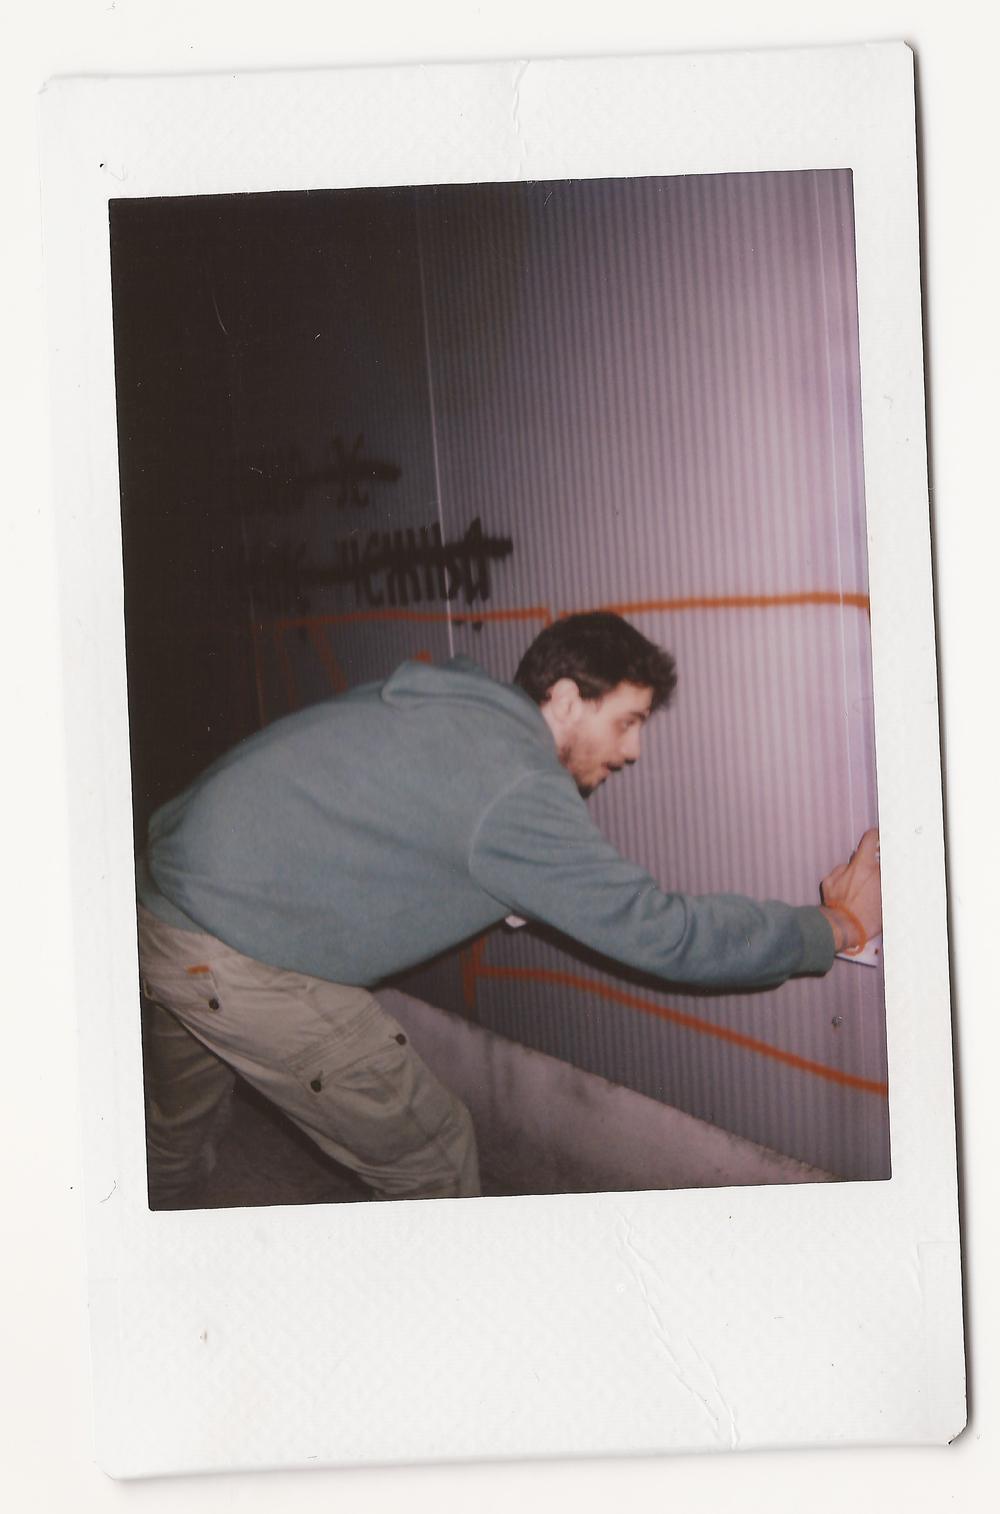 ItaGraff Polaroid.jpg